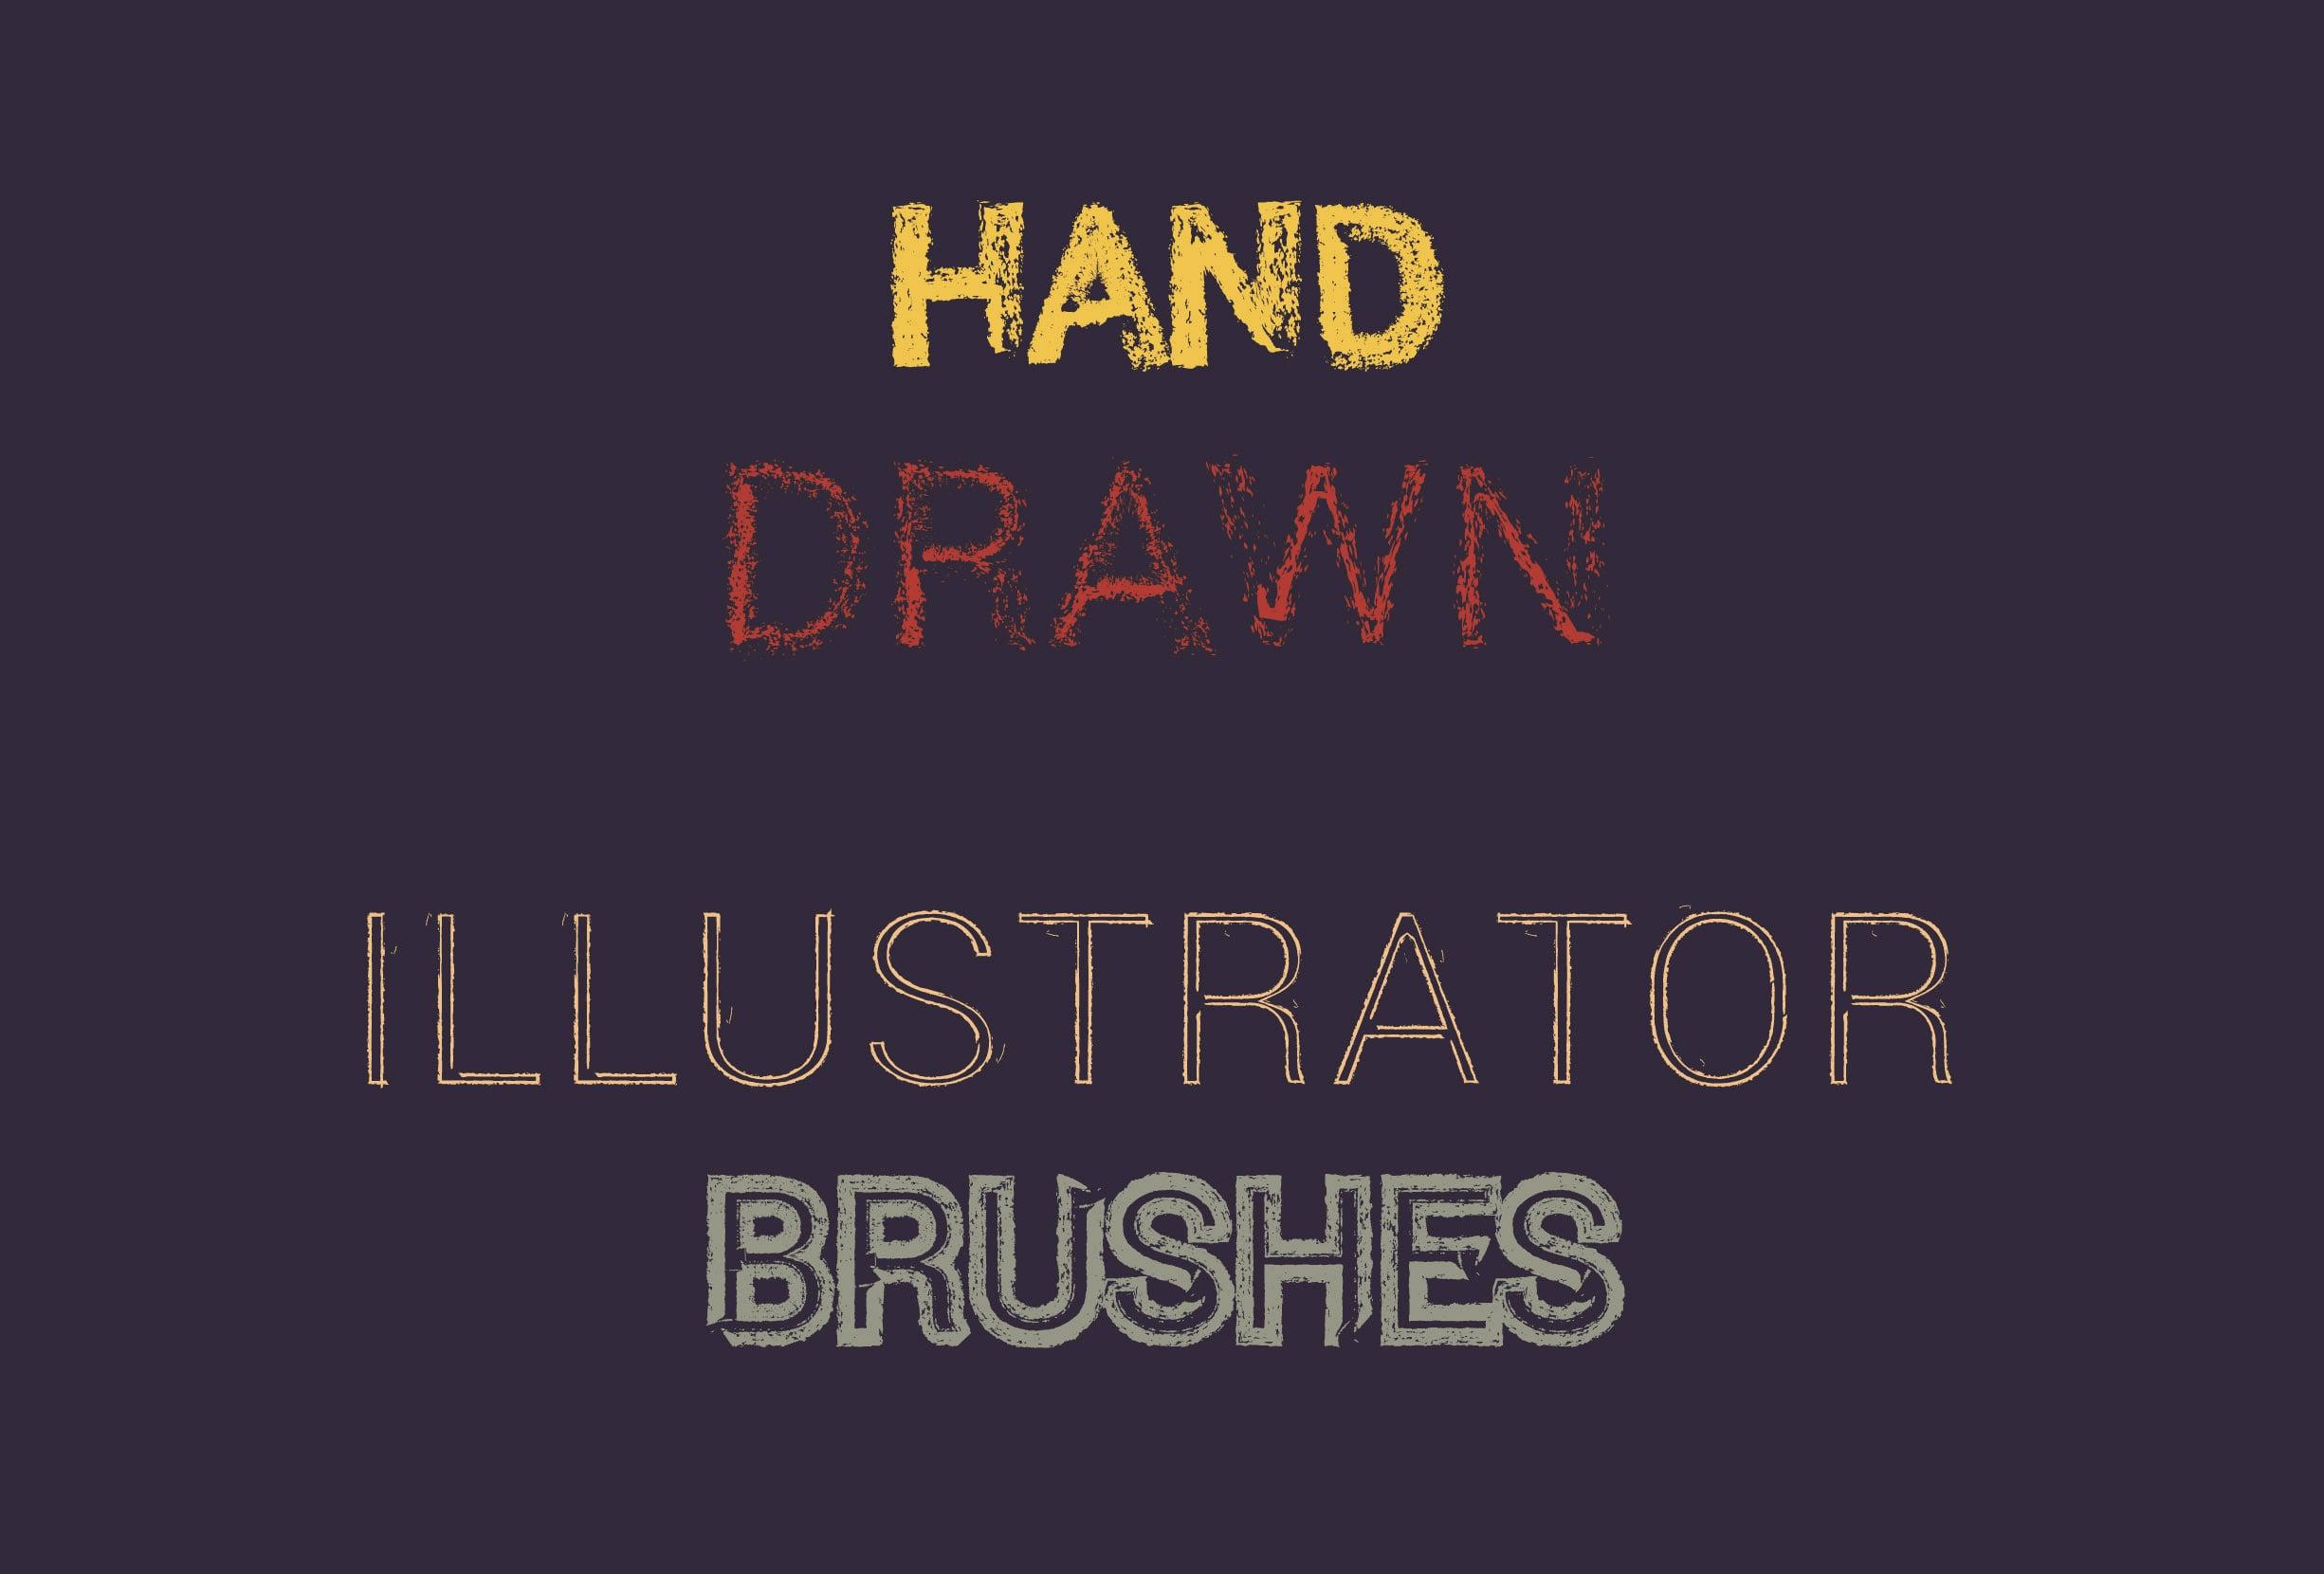 30 Best Line Art Illustrator Brushes (Wax Crayons) - brushes presentation 1111 0